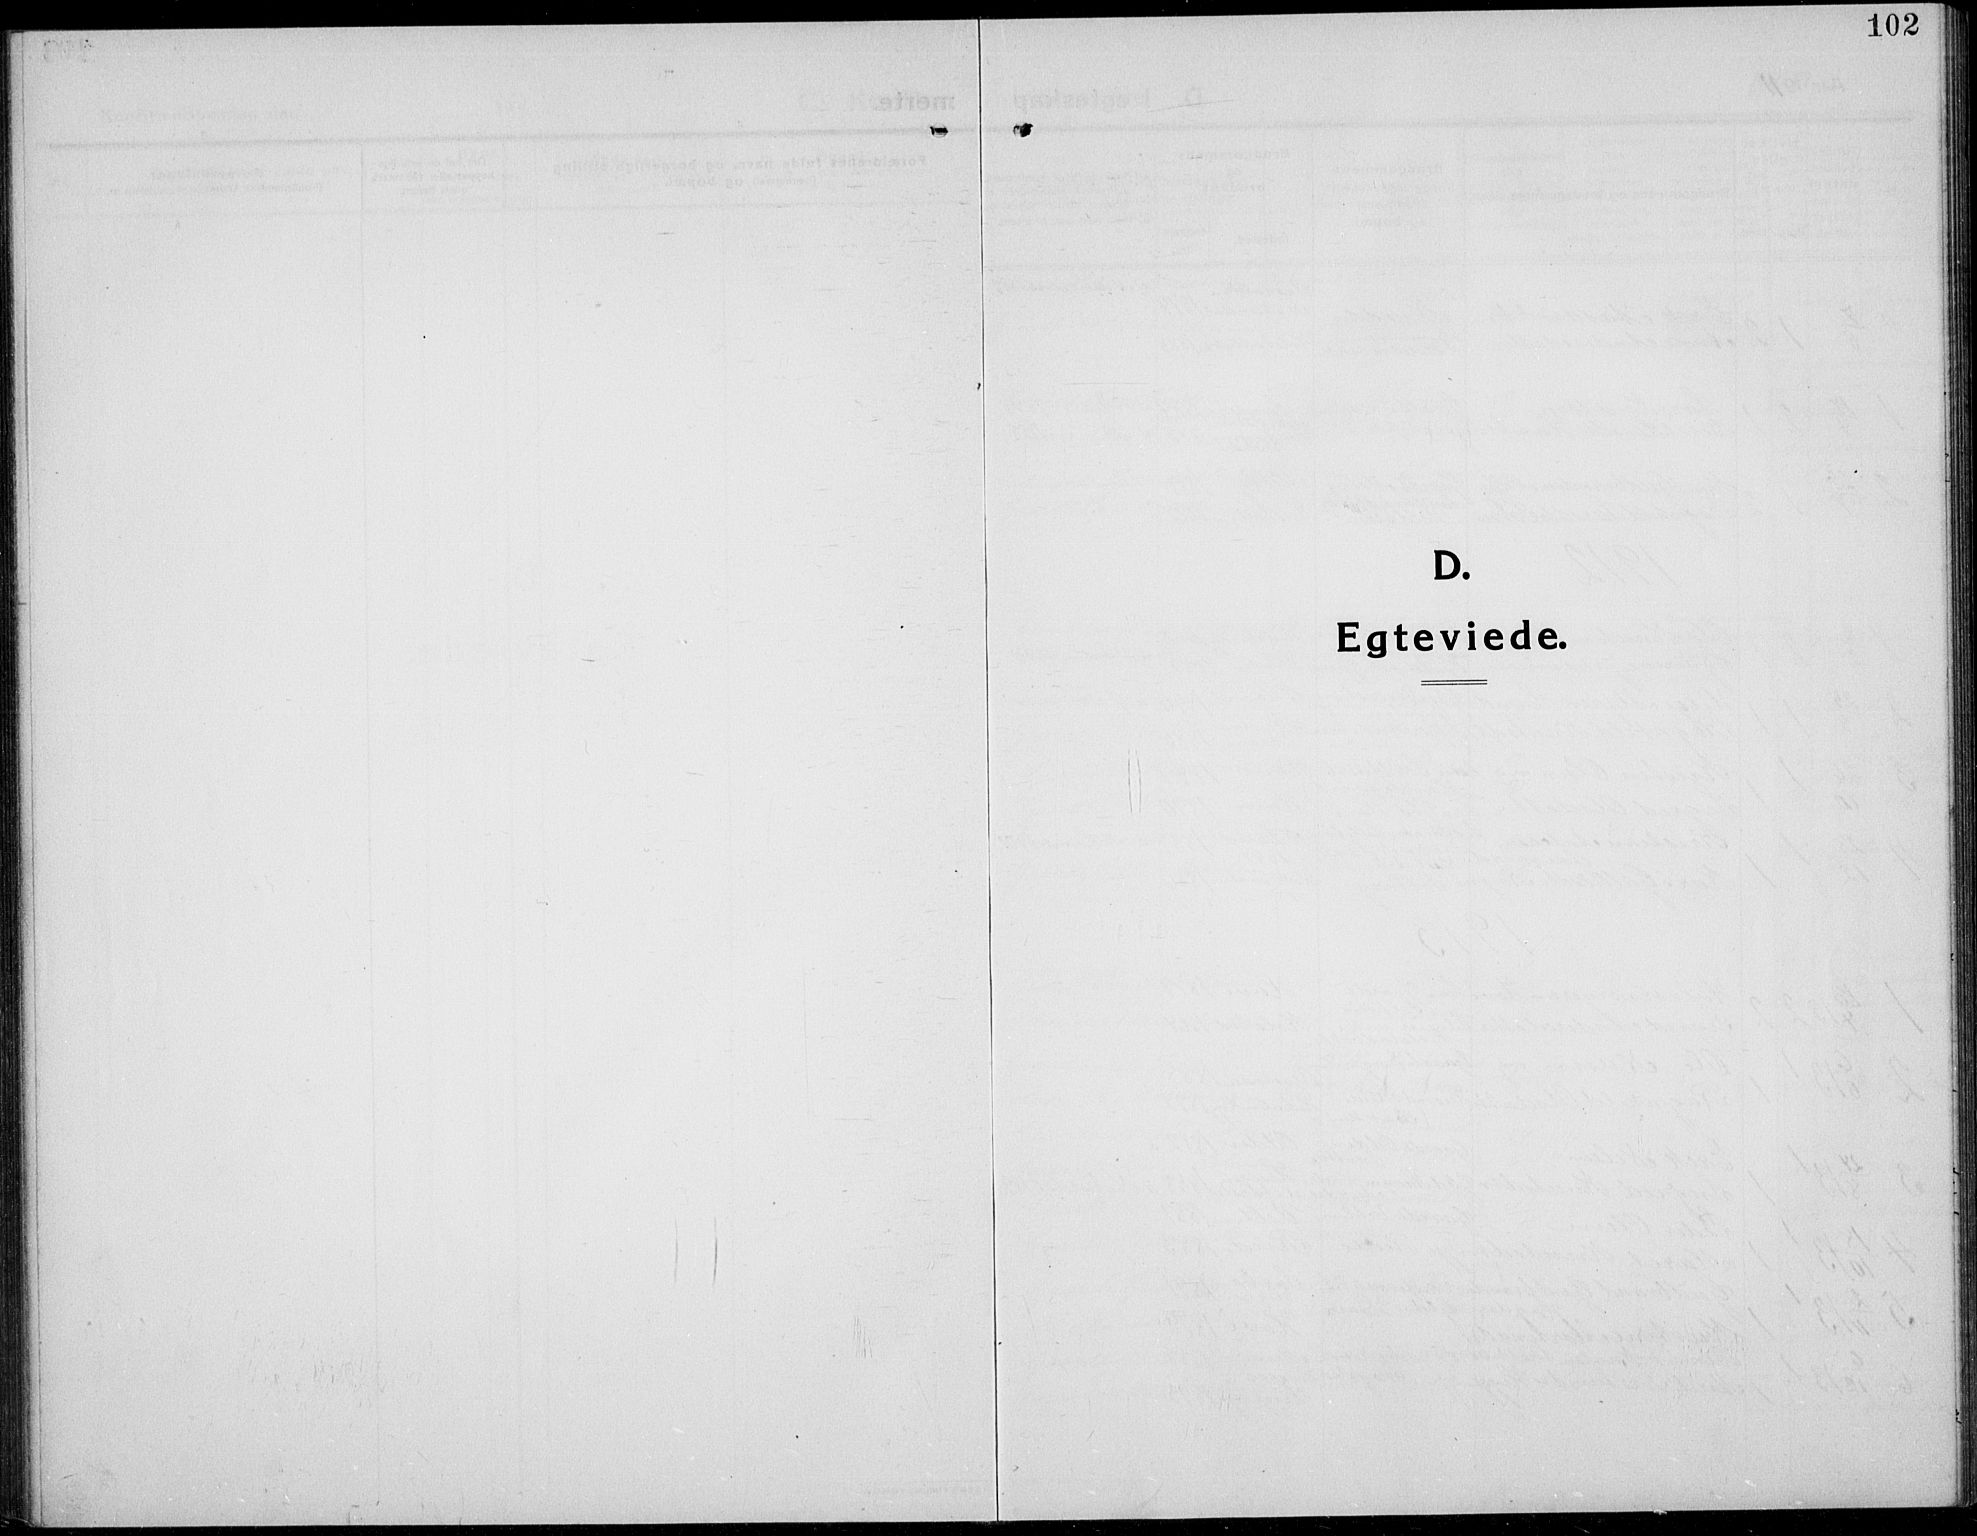 SAH, Øystre Slidre prestekontor, Klokkerbok nr. 8, 1911-1938, s. 102